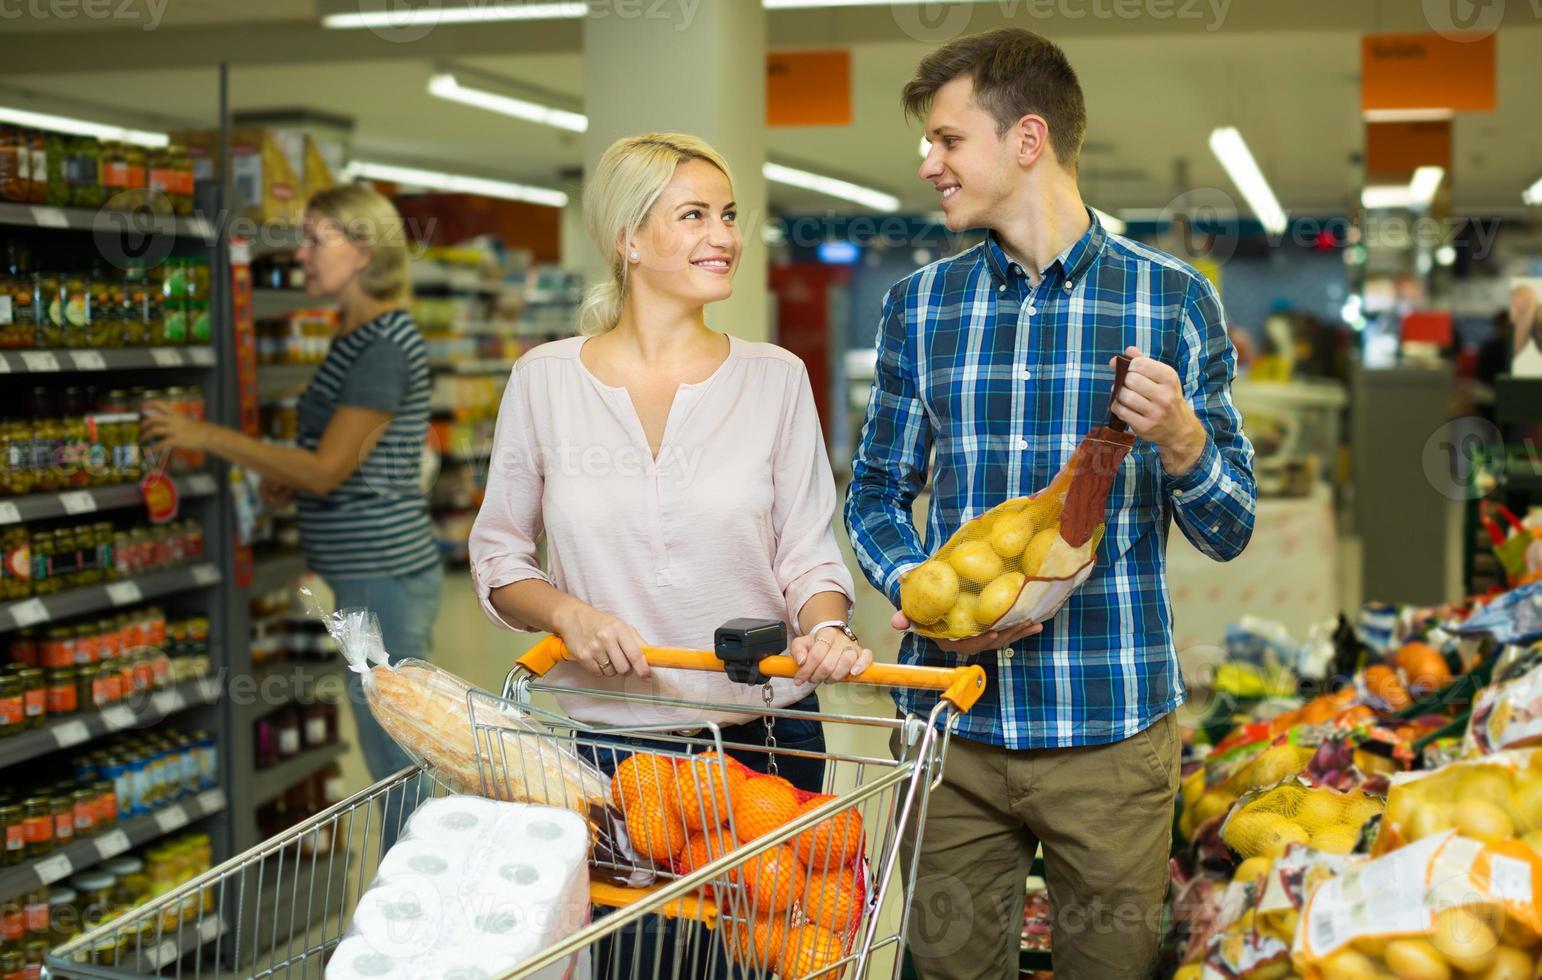 Familie kauft süße Früchte foto